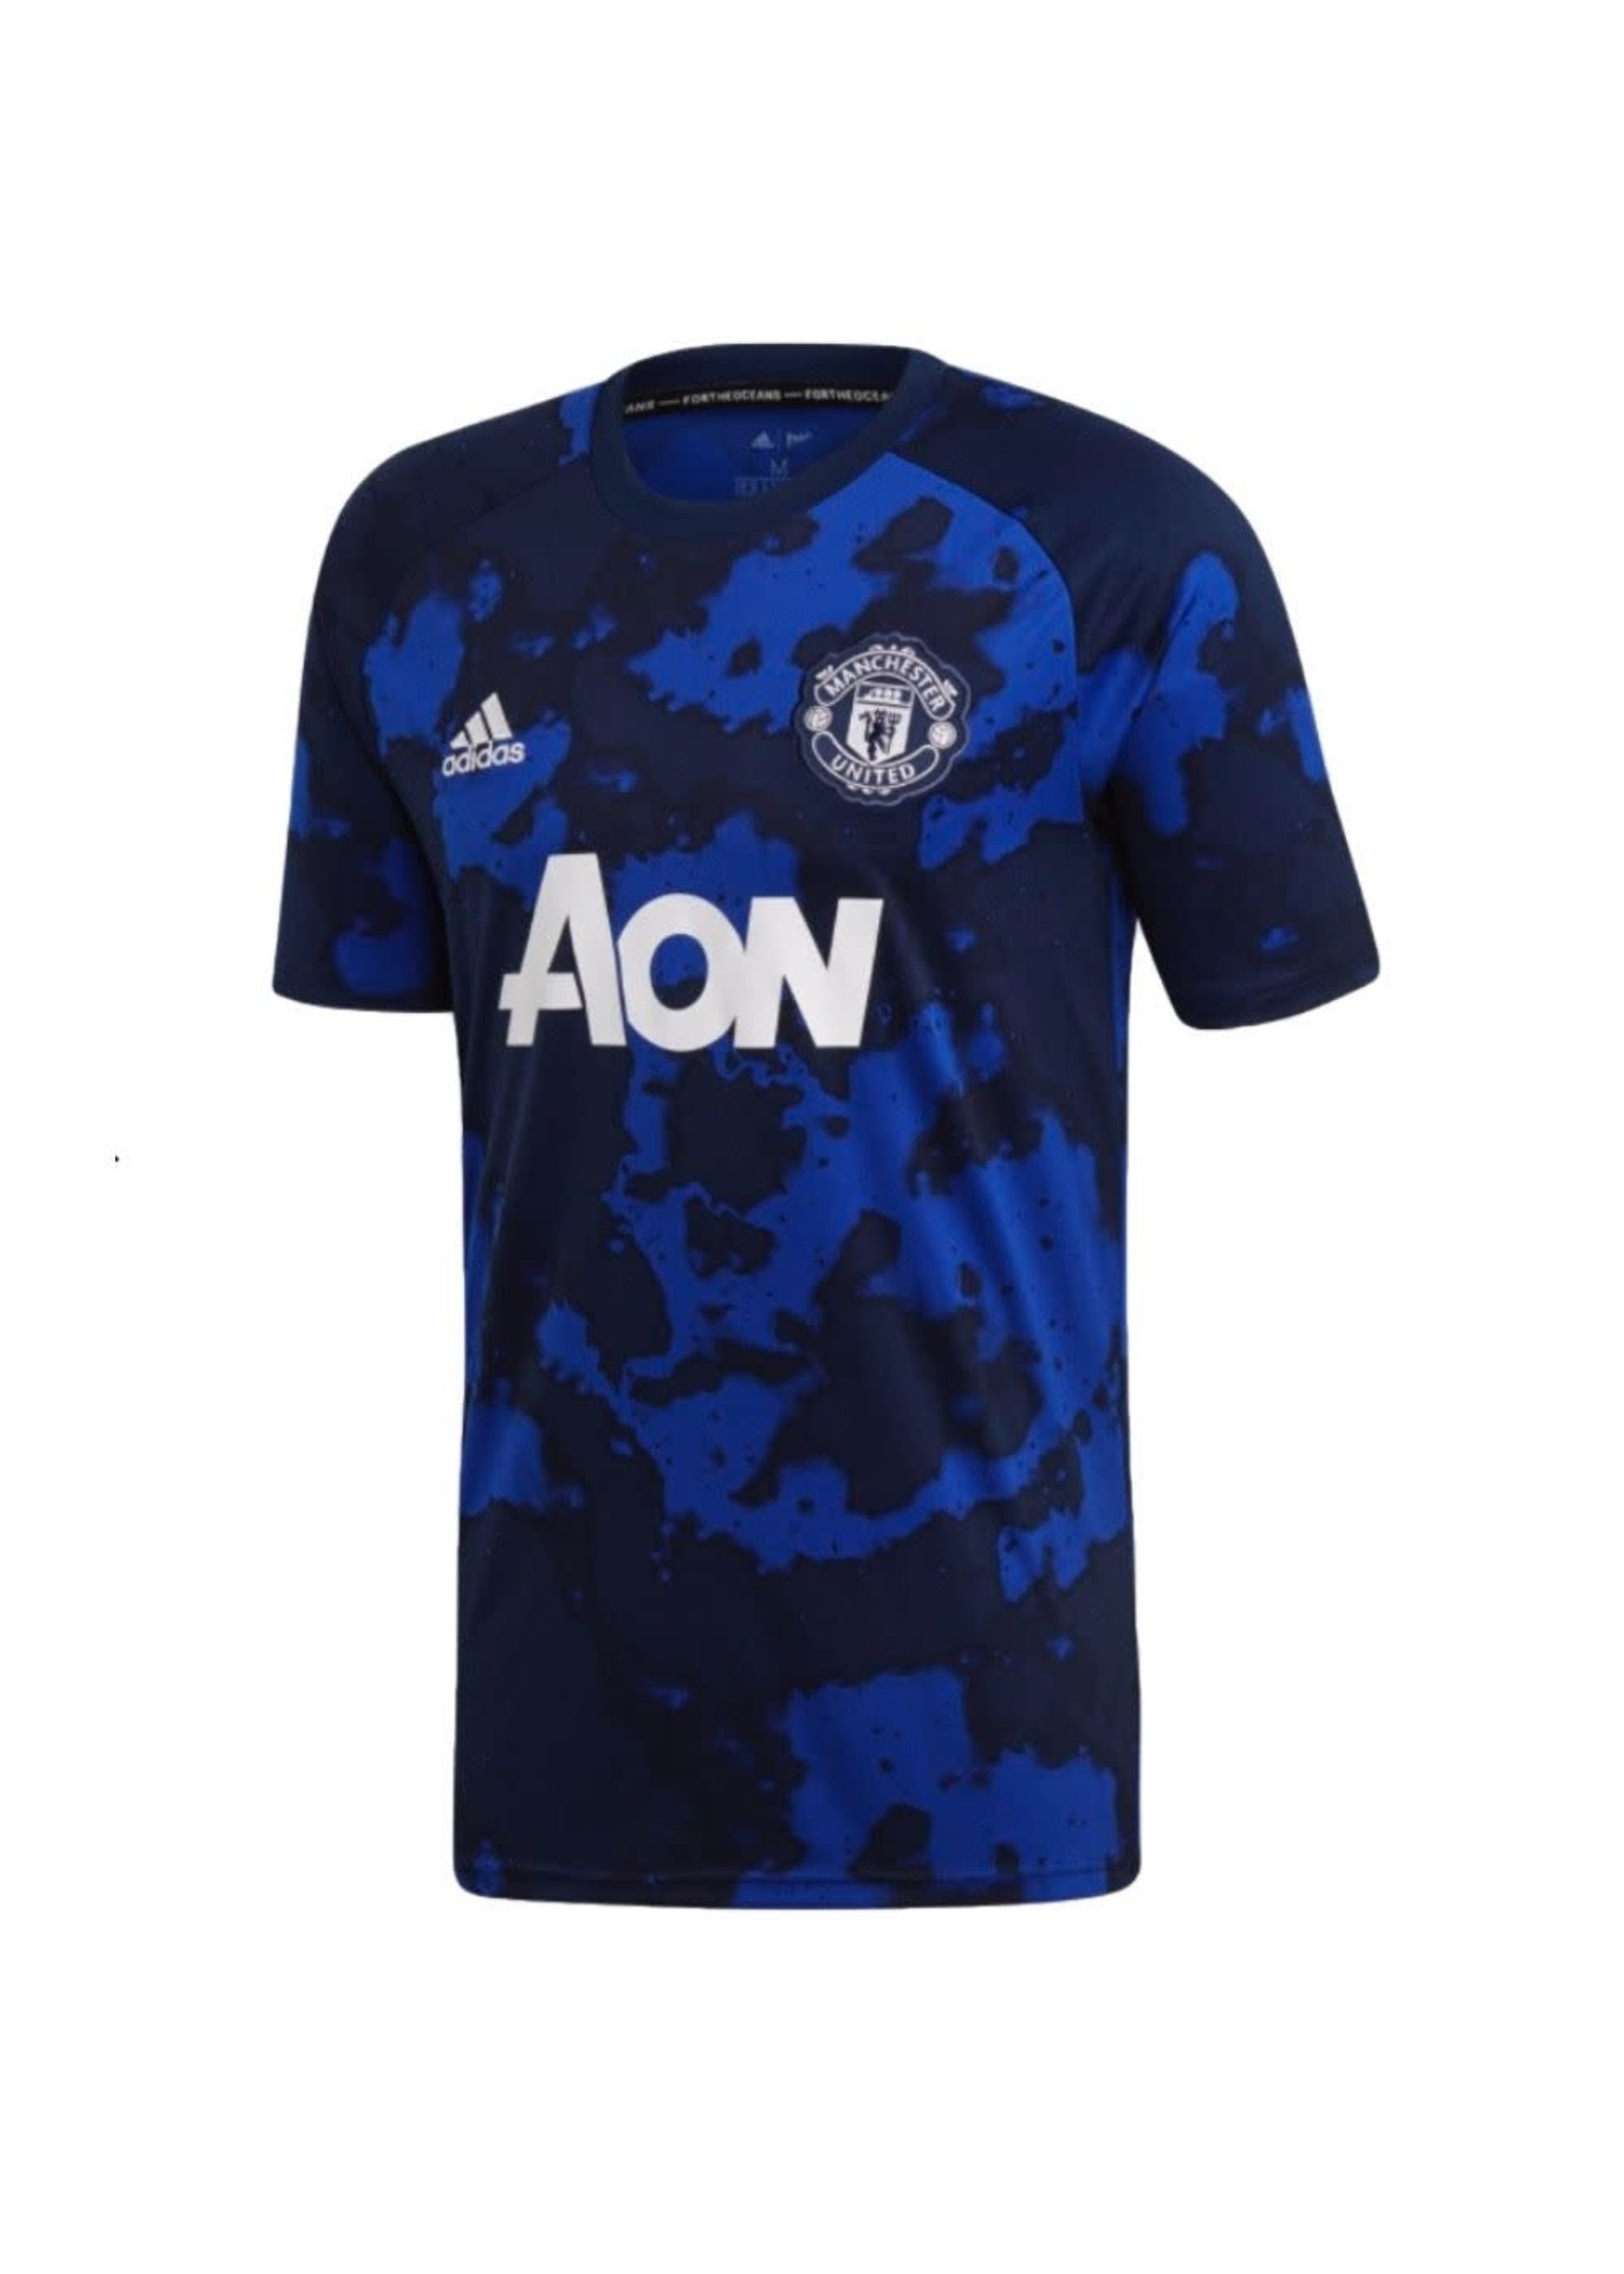 Adidas 2019/20 MUFC H PRESHI